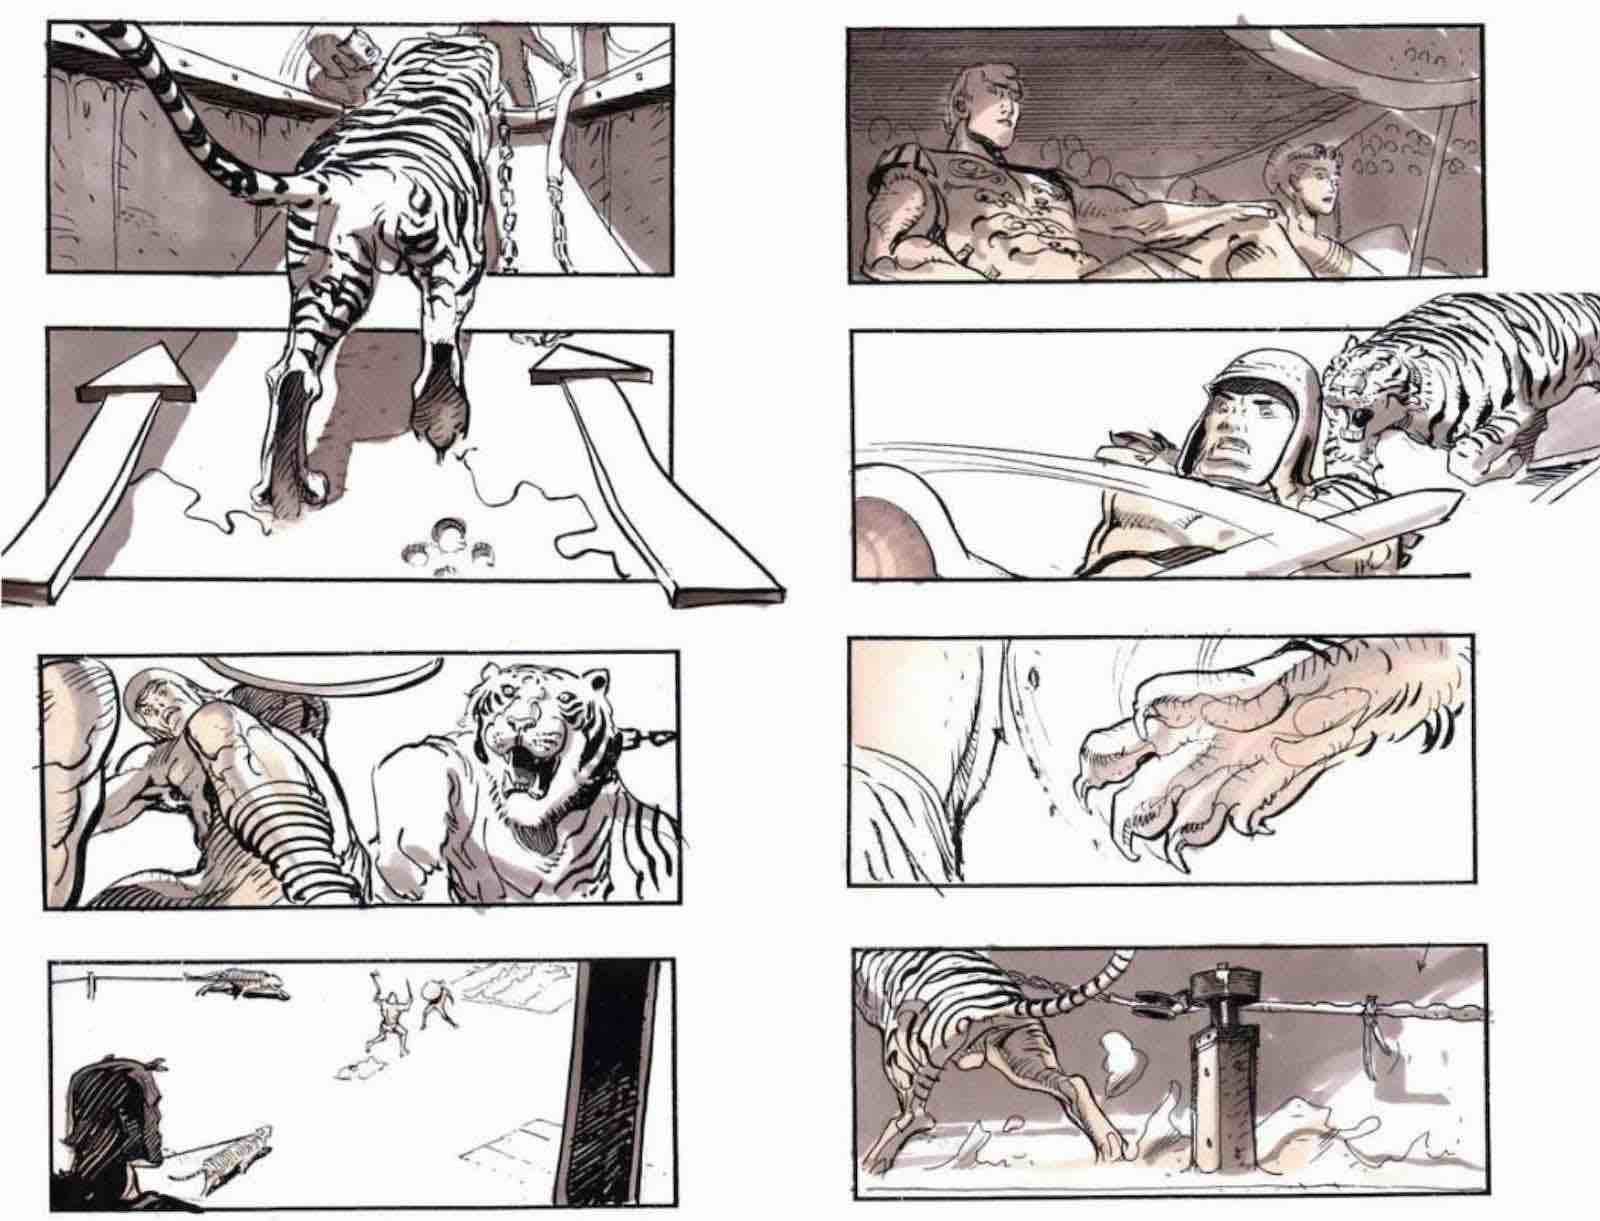 Storyboard Examples for Film - Sylvain Despretz - Ridley Scott - Gladiator - StudioBinder